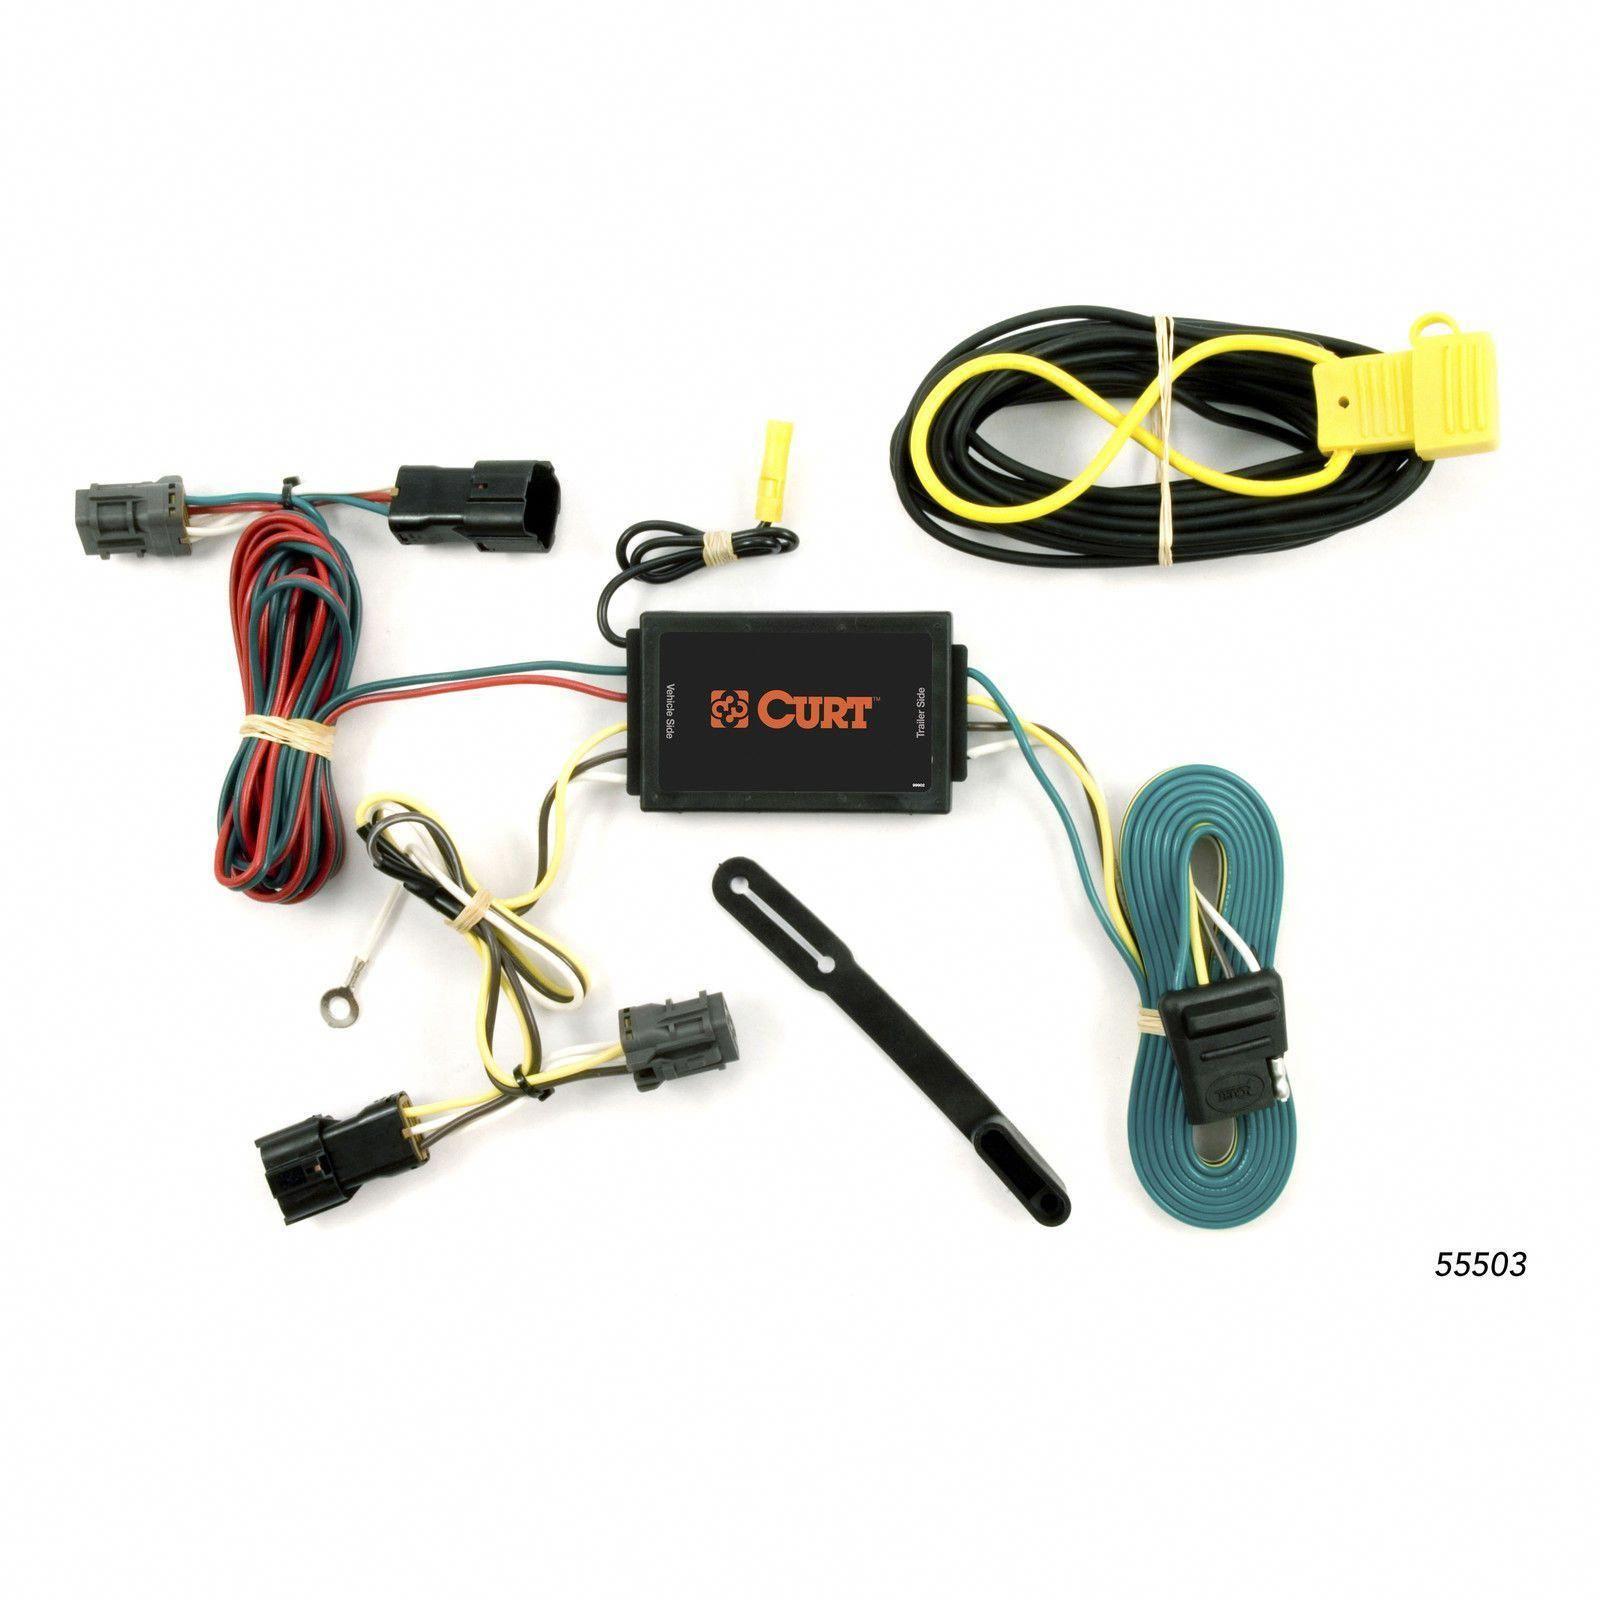 small resolution of curt 55503 wiring harness for 07 09 hyundai entourage 06 14 kia sedona kiasedona